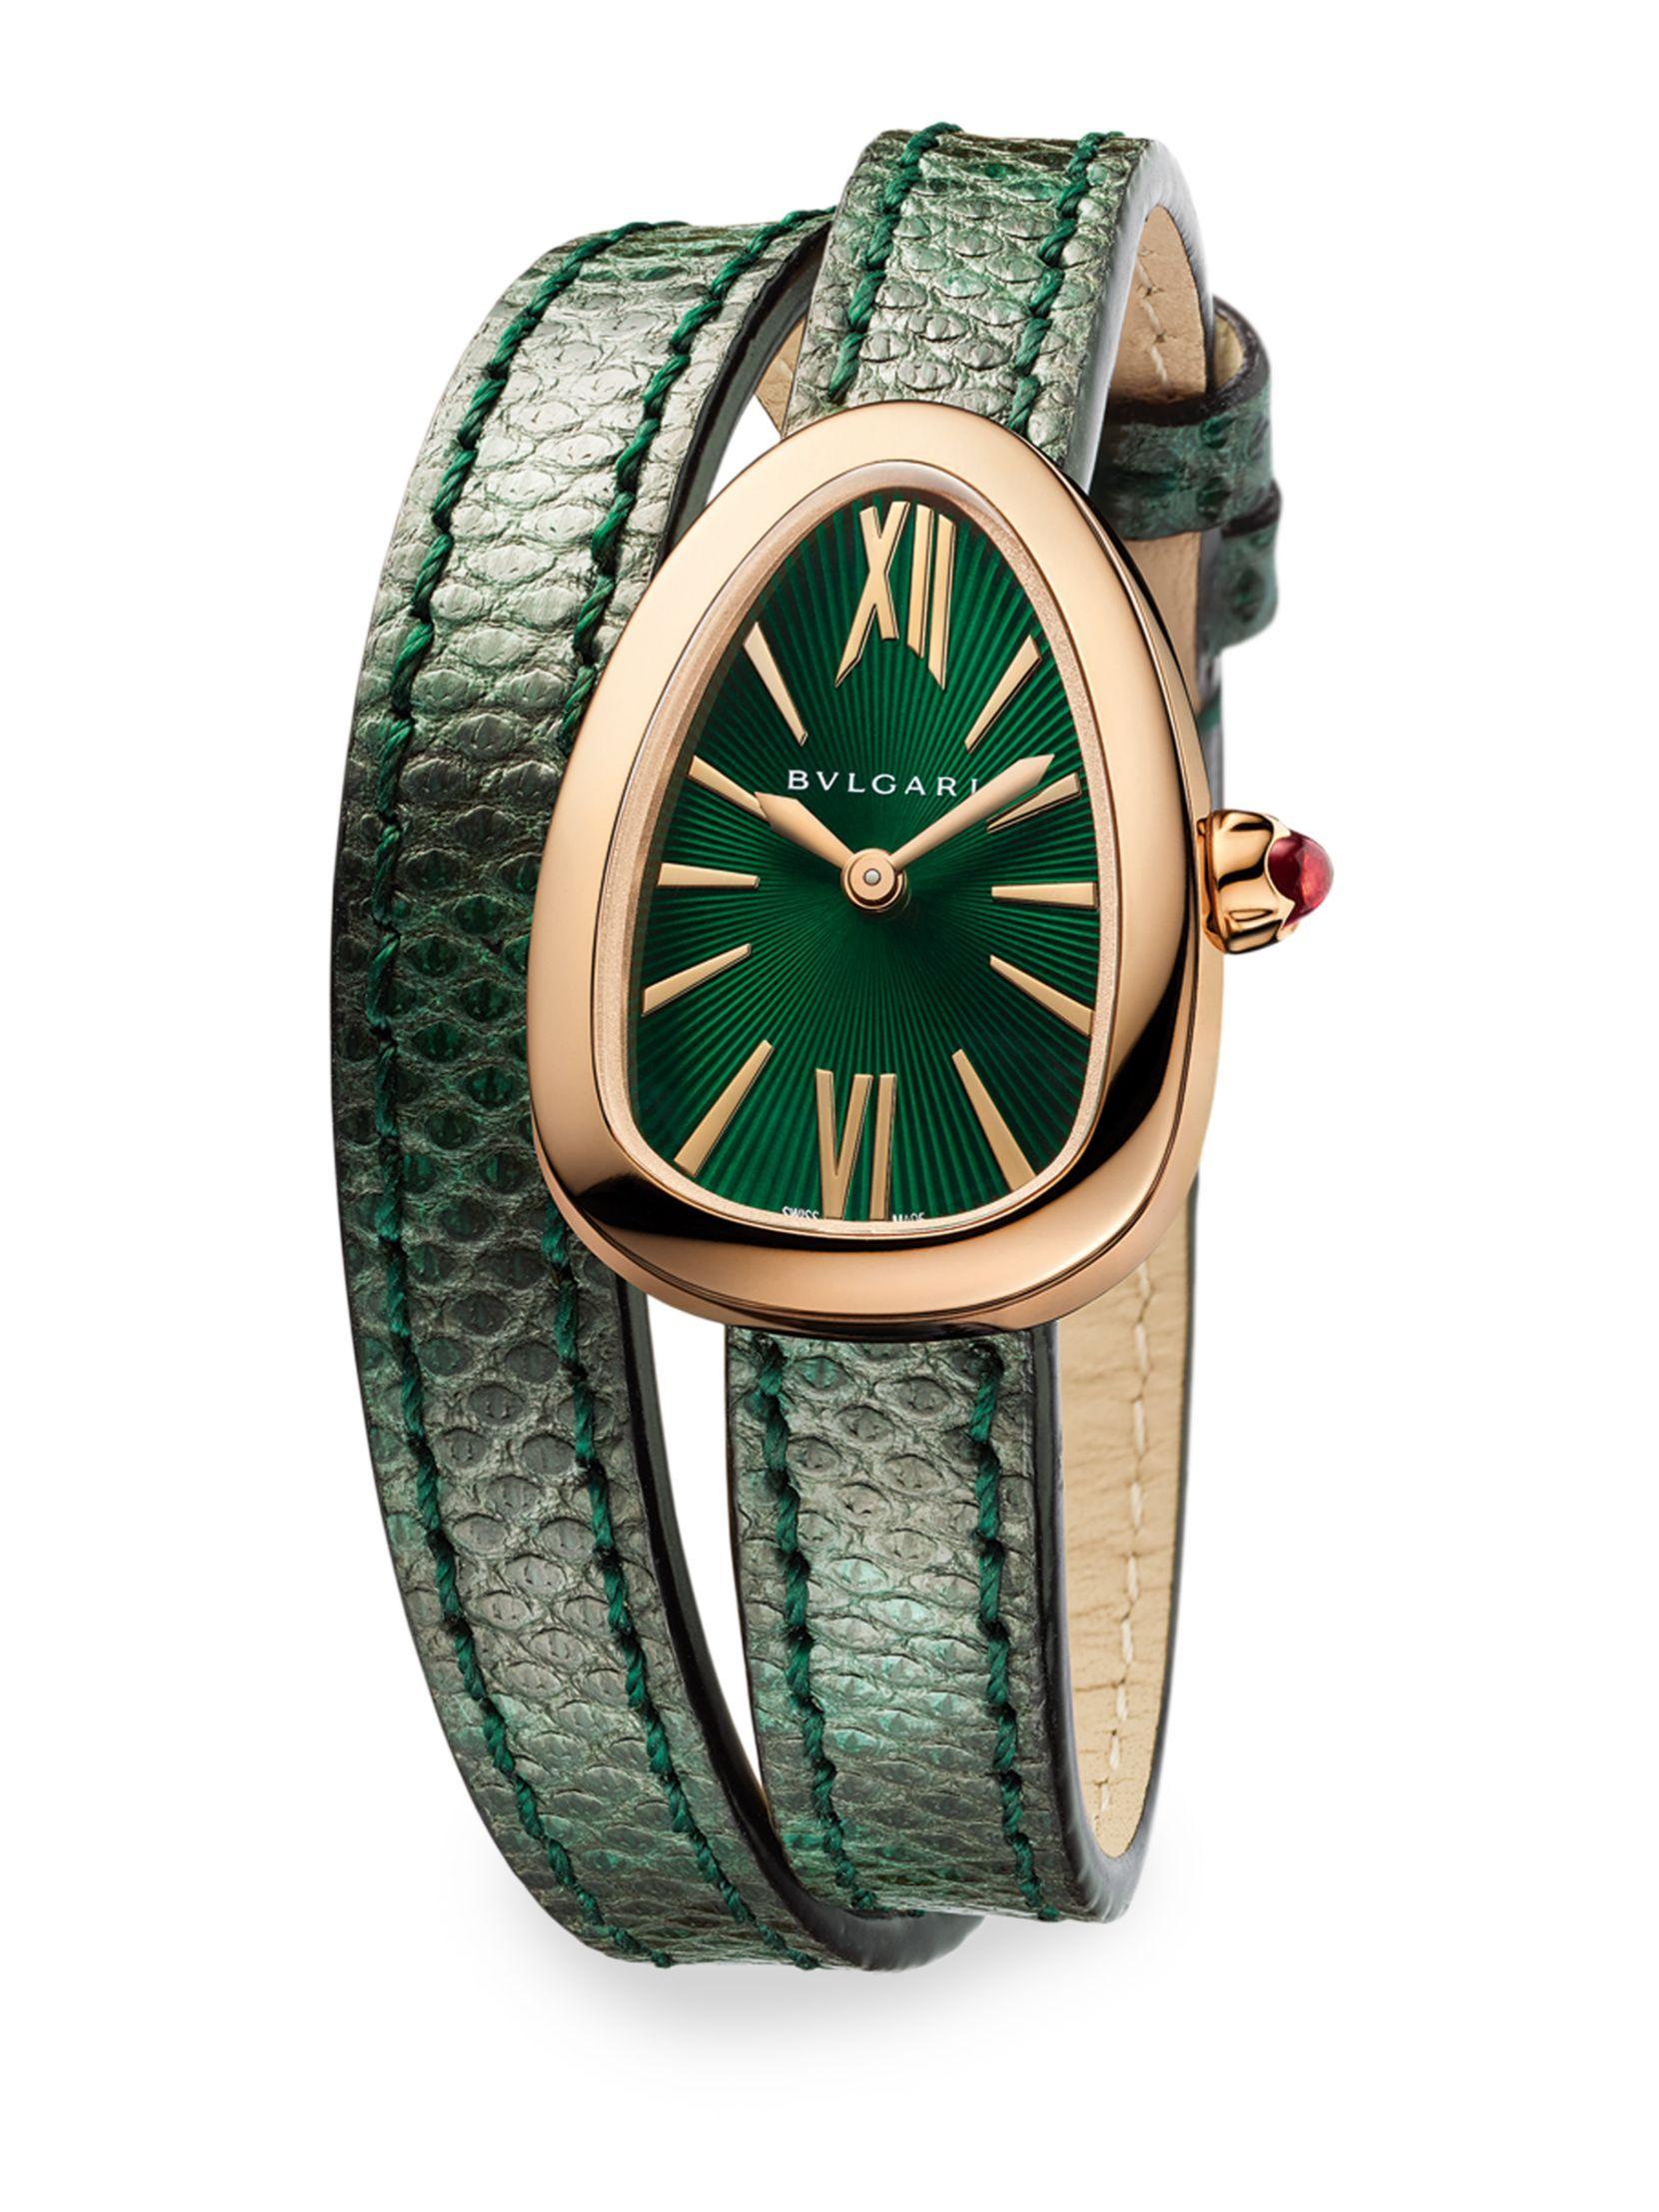 3e015b0c94f Relógios Femininos · BVLGARI Serpenti 18K Pink Gold   Green Karung Strap  Watch Bolsas De Grife